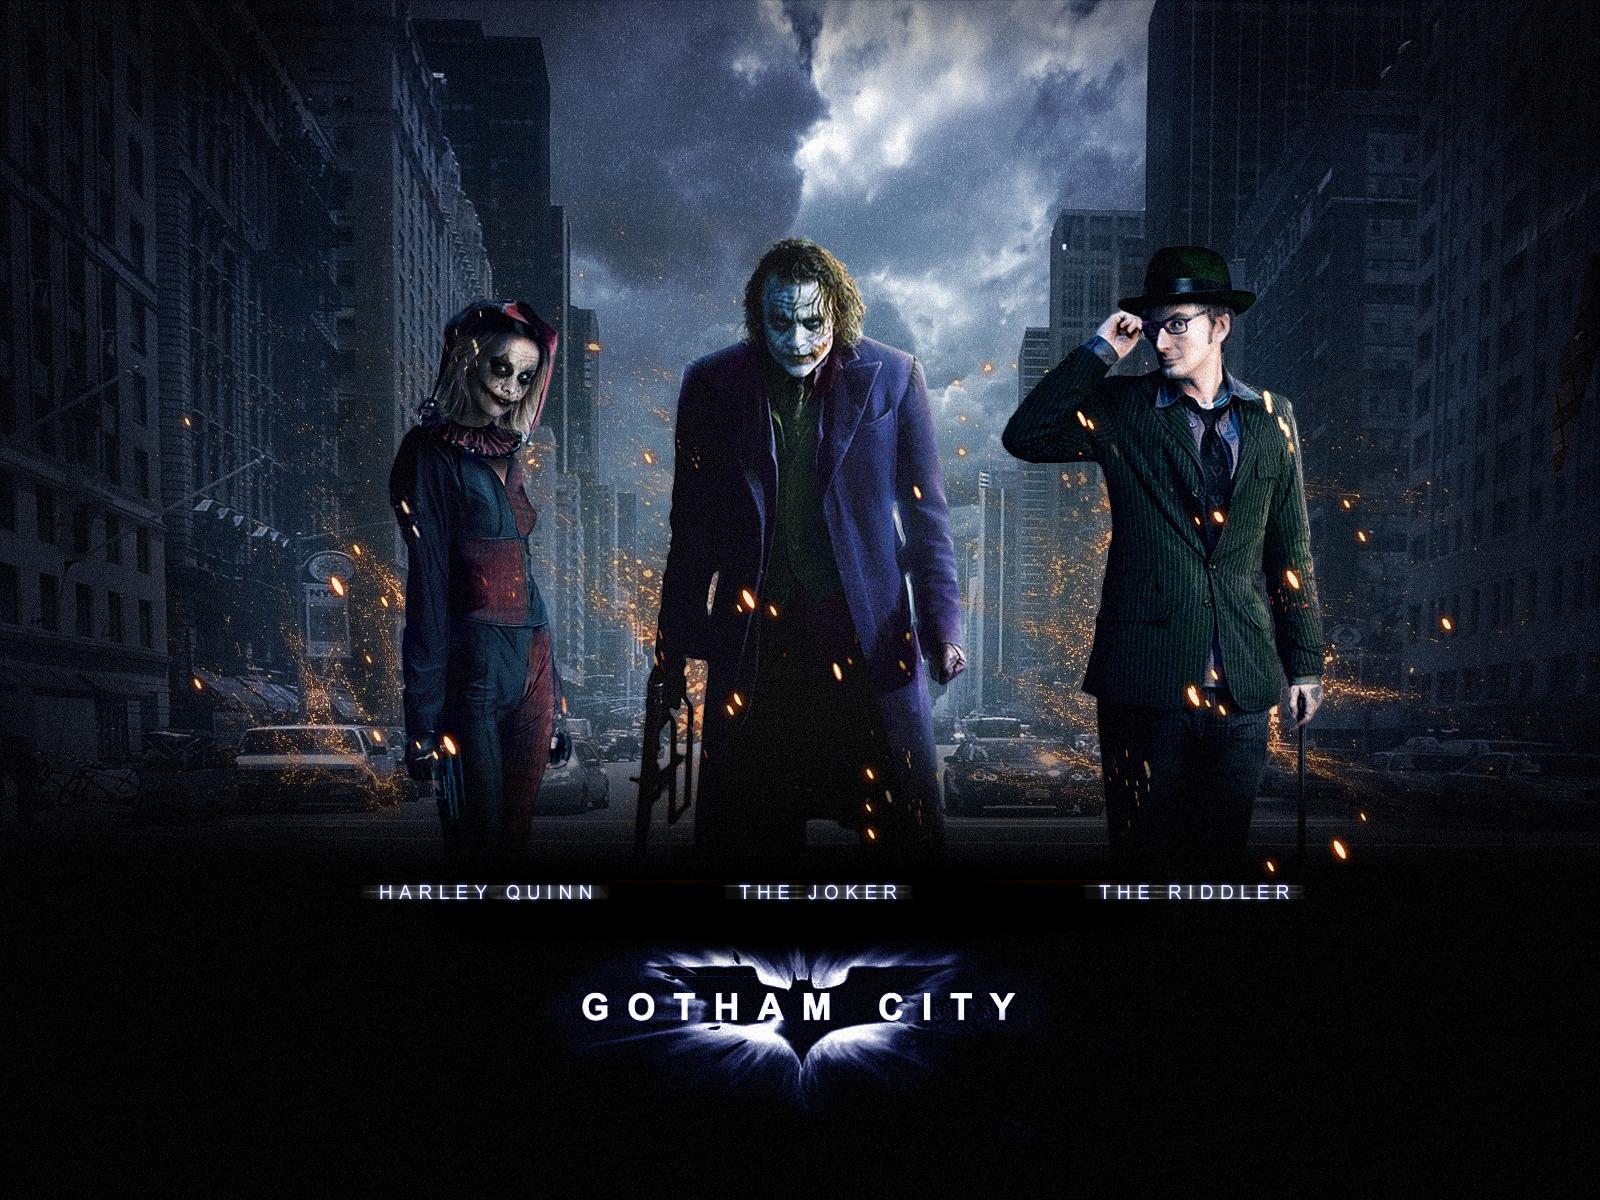 batman: gotham city wallpaperbilloi on deviantart